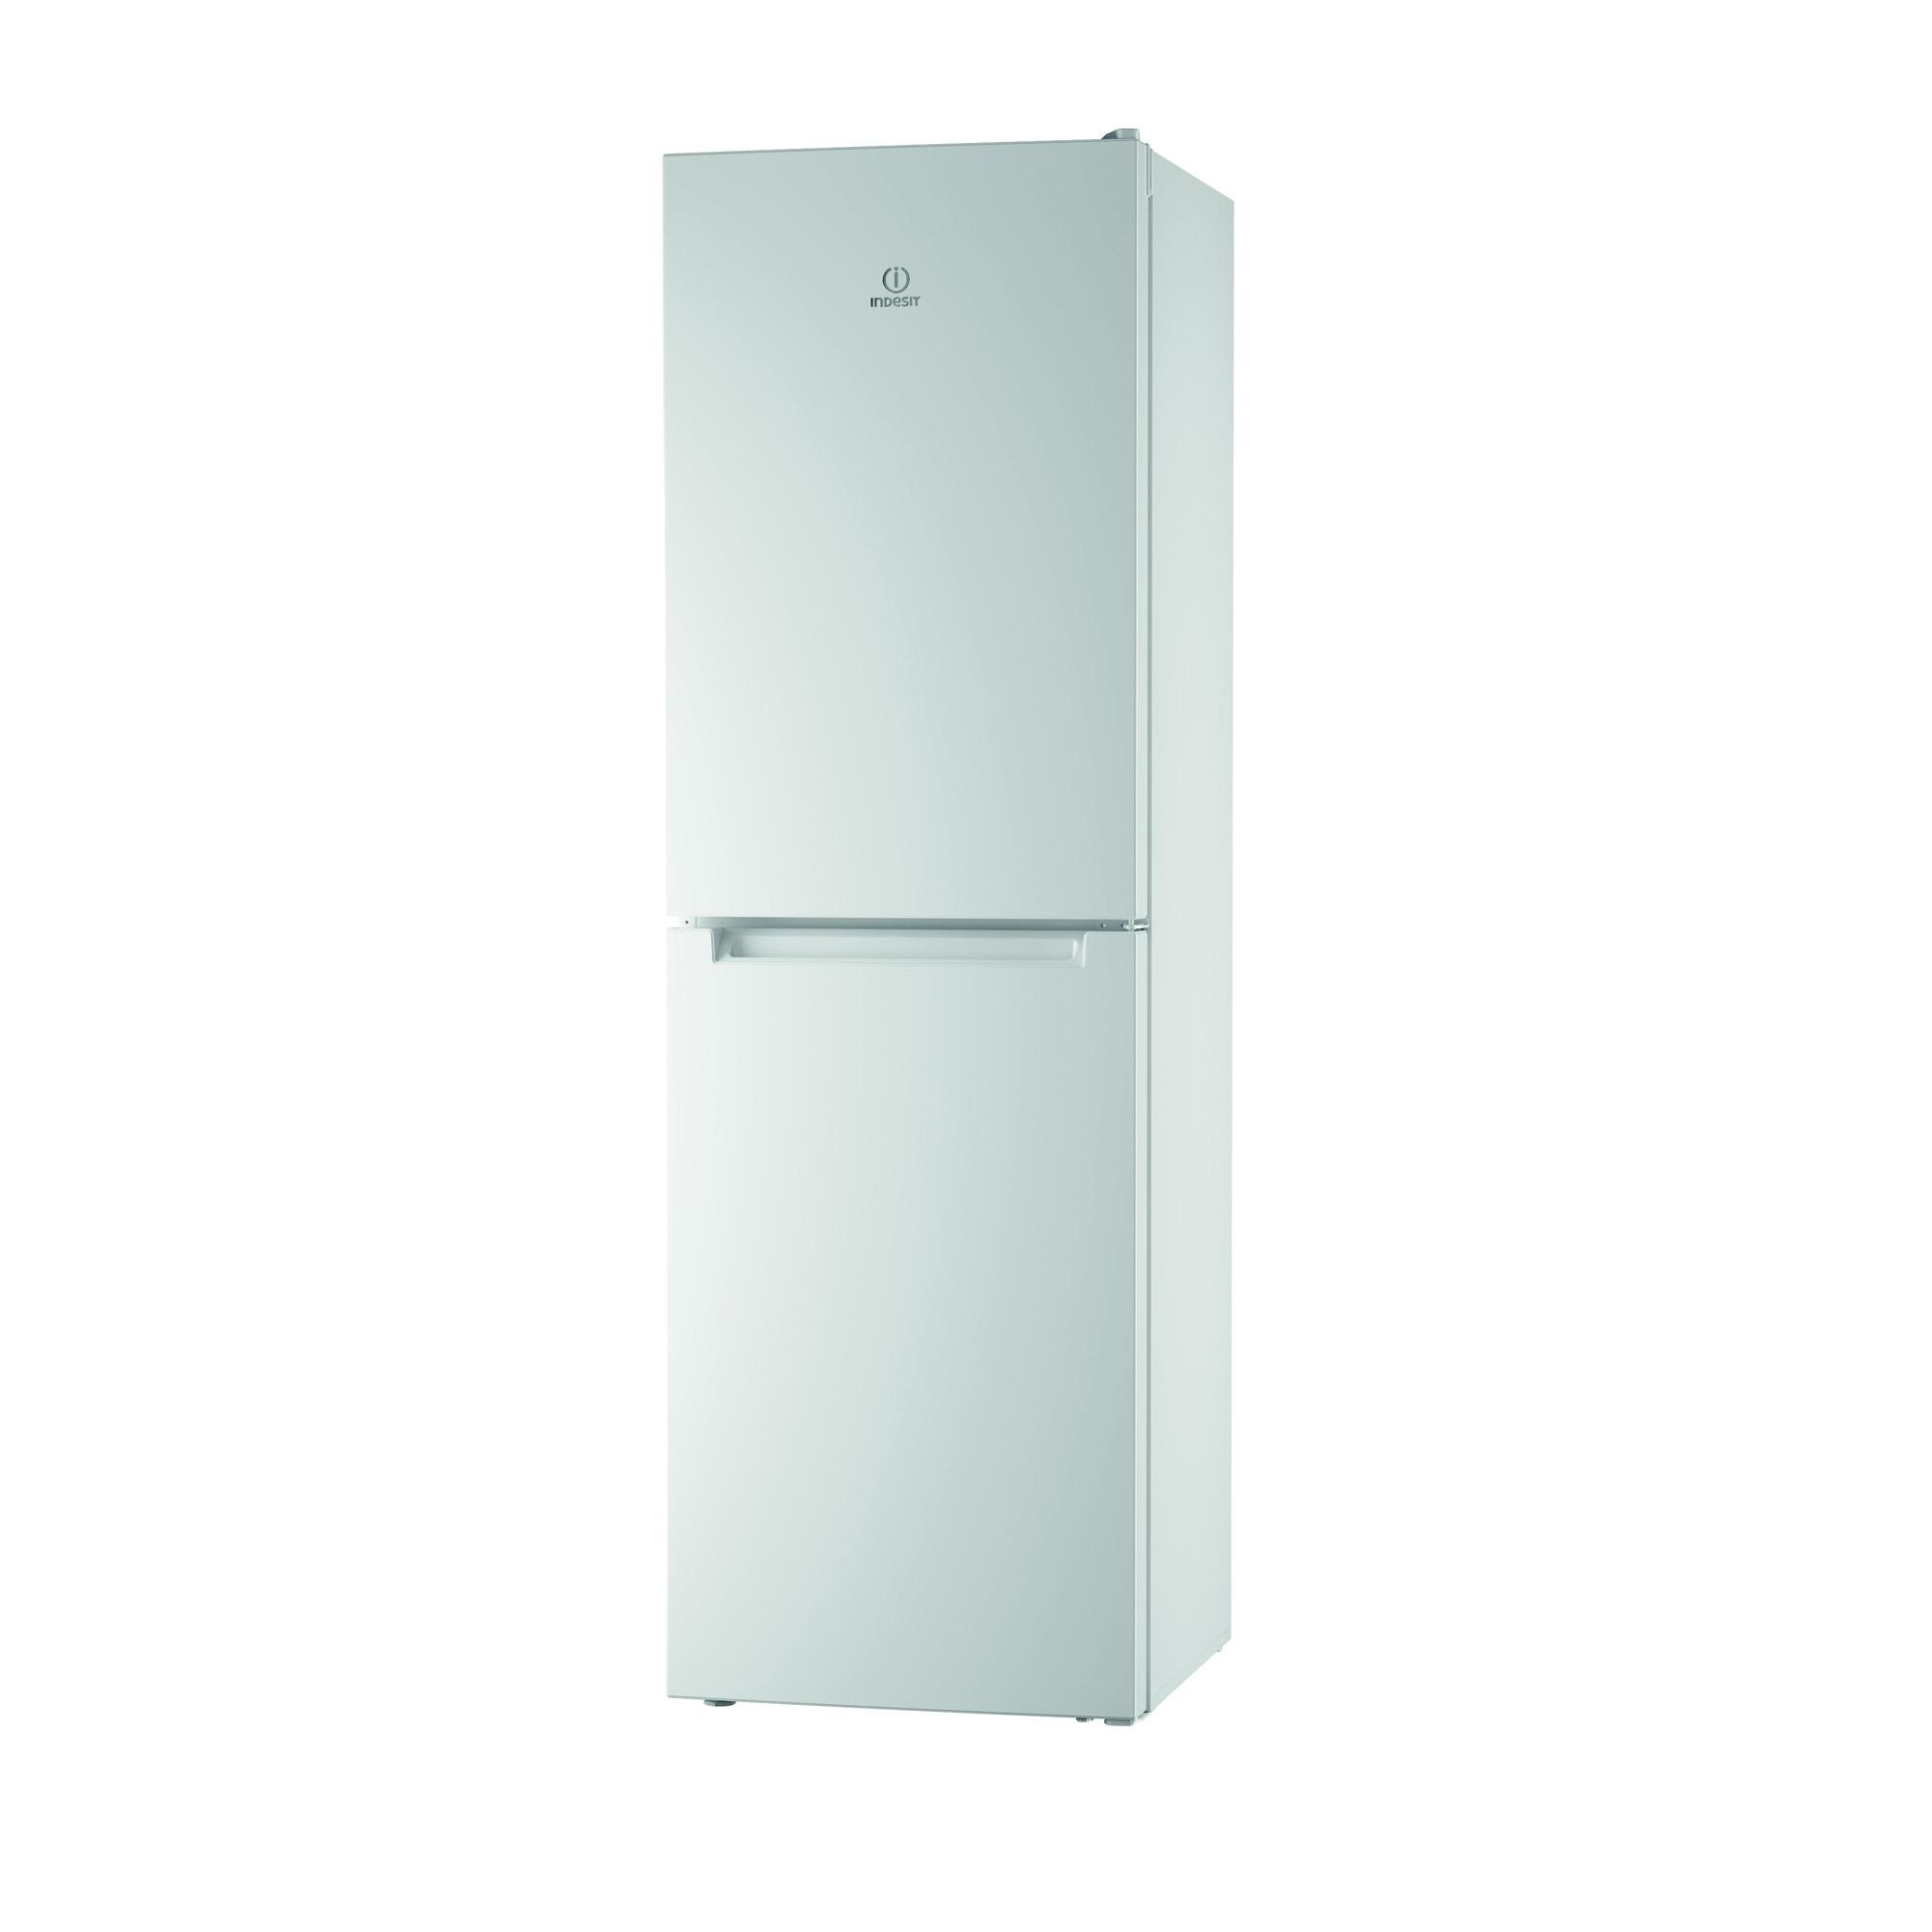 Indesit Ld85f1w 1 Frost Free Fridge Freezer Hughes